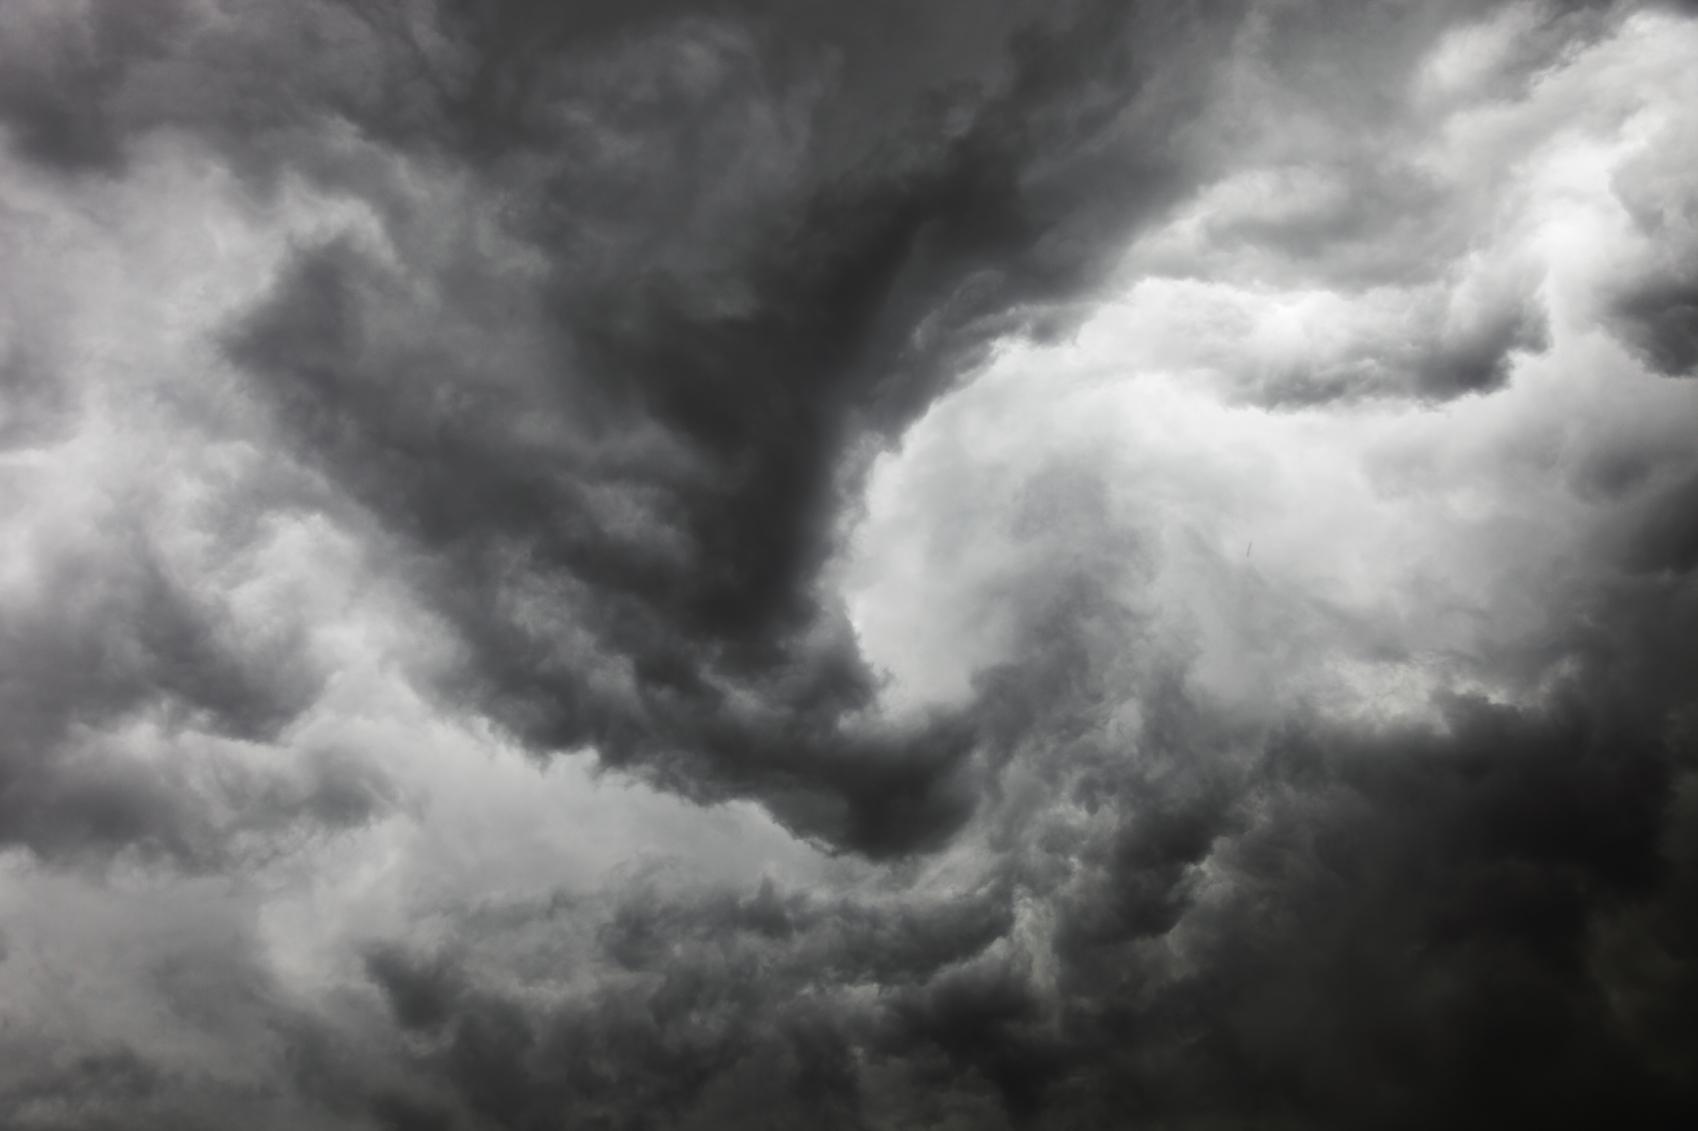 Storms Stormy Weather Rain Raining Rain121 Gif Clip Art Nature Seasons